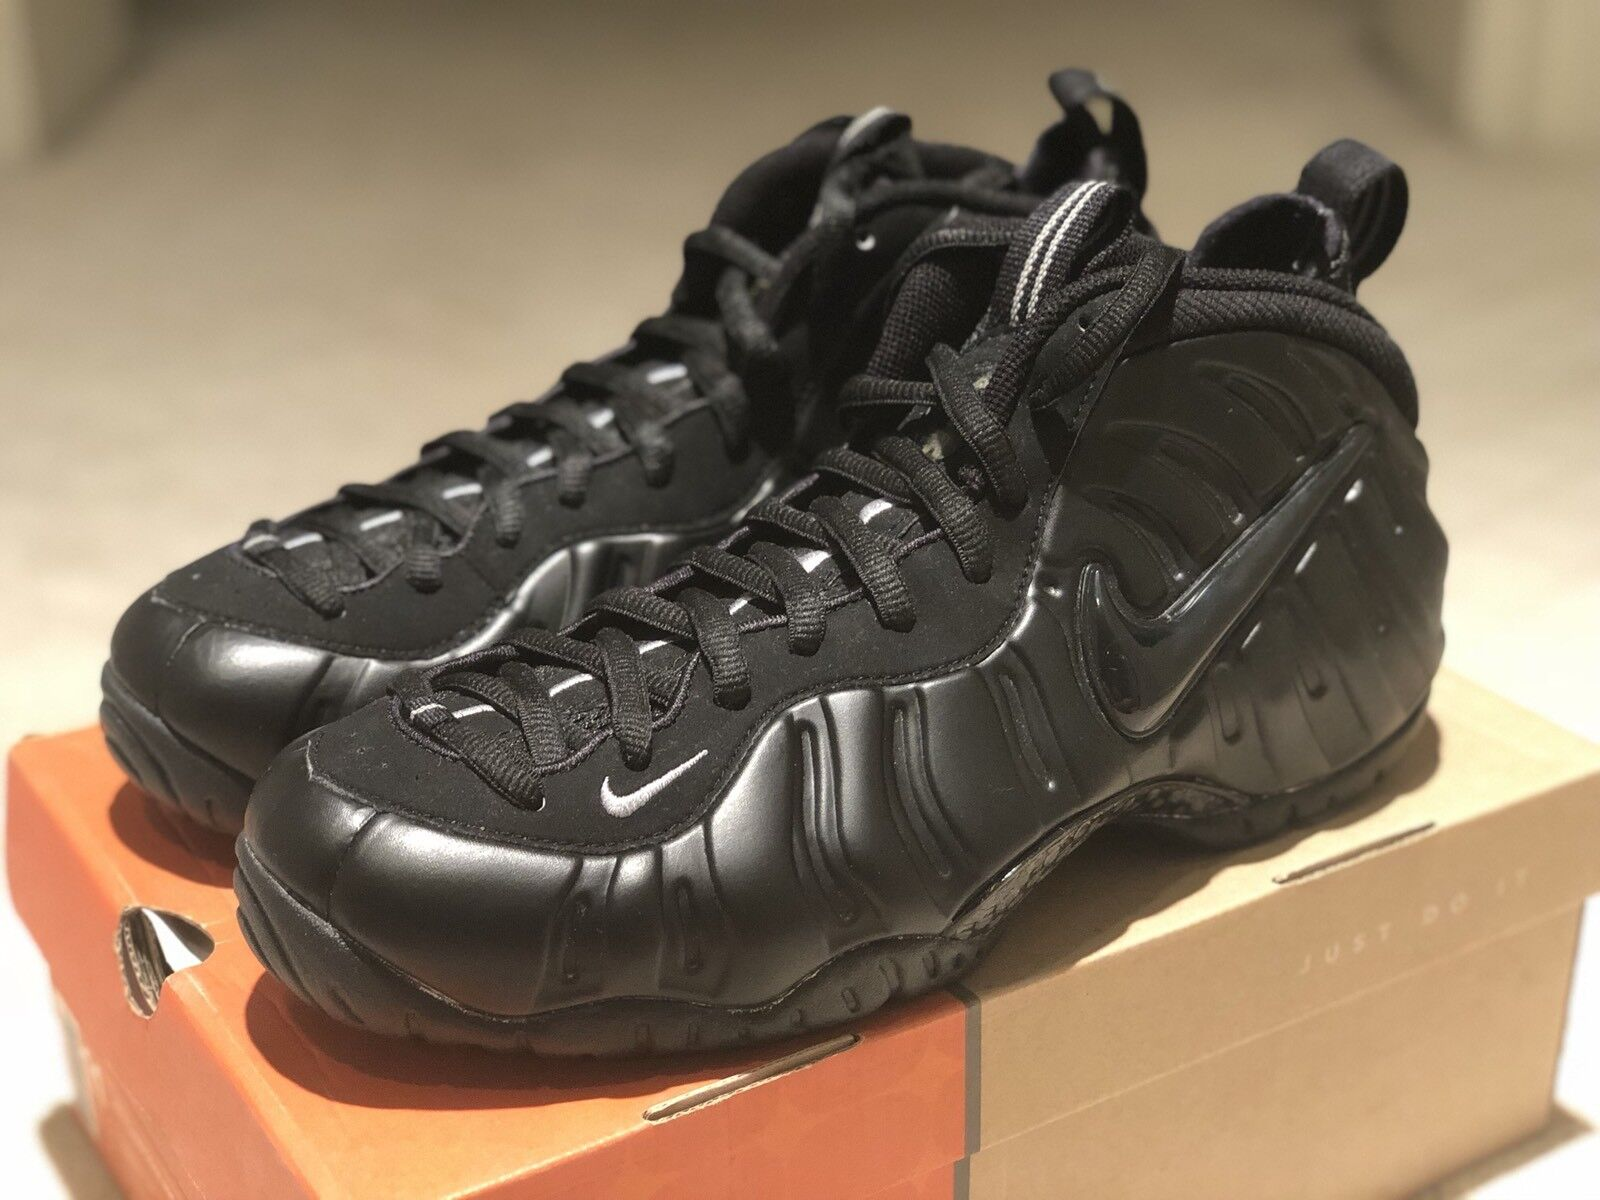 2002 Nike Air Foamposite Pro shoes Size 11 Black Medium Grey 630304 002